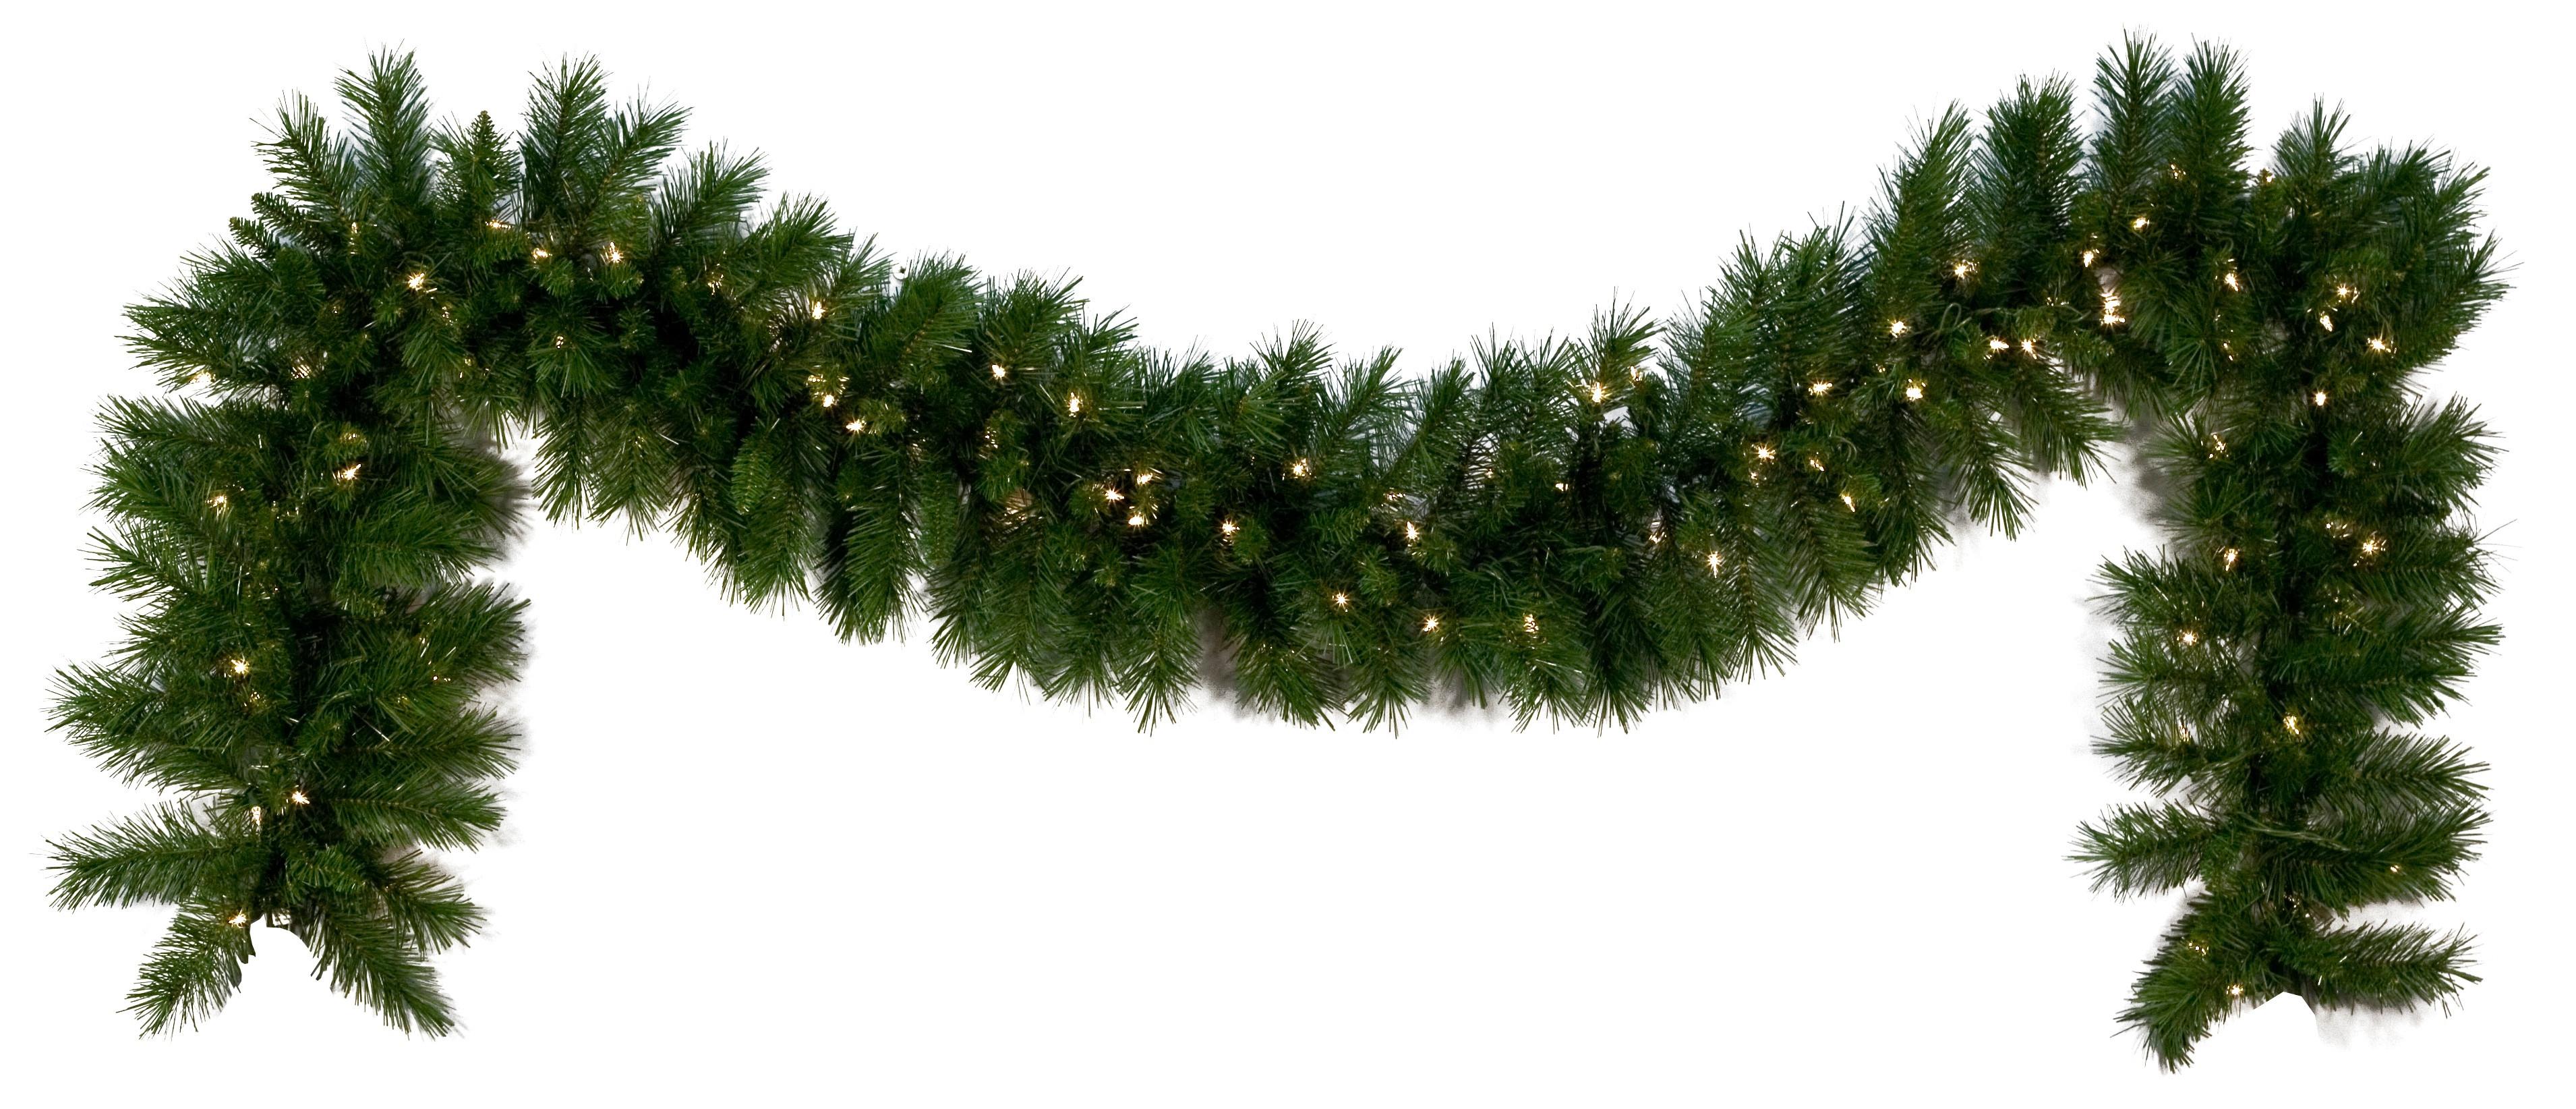 Outdoor Christmas Garland With Lights  Lighted Christmas Garland Dunhill Fir Prelit LED